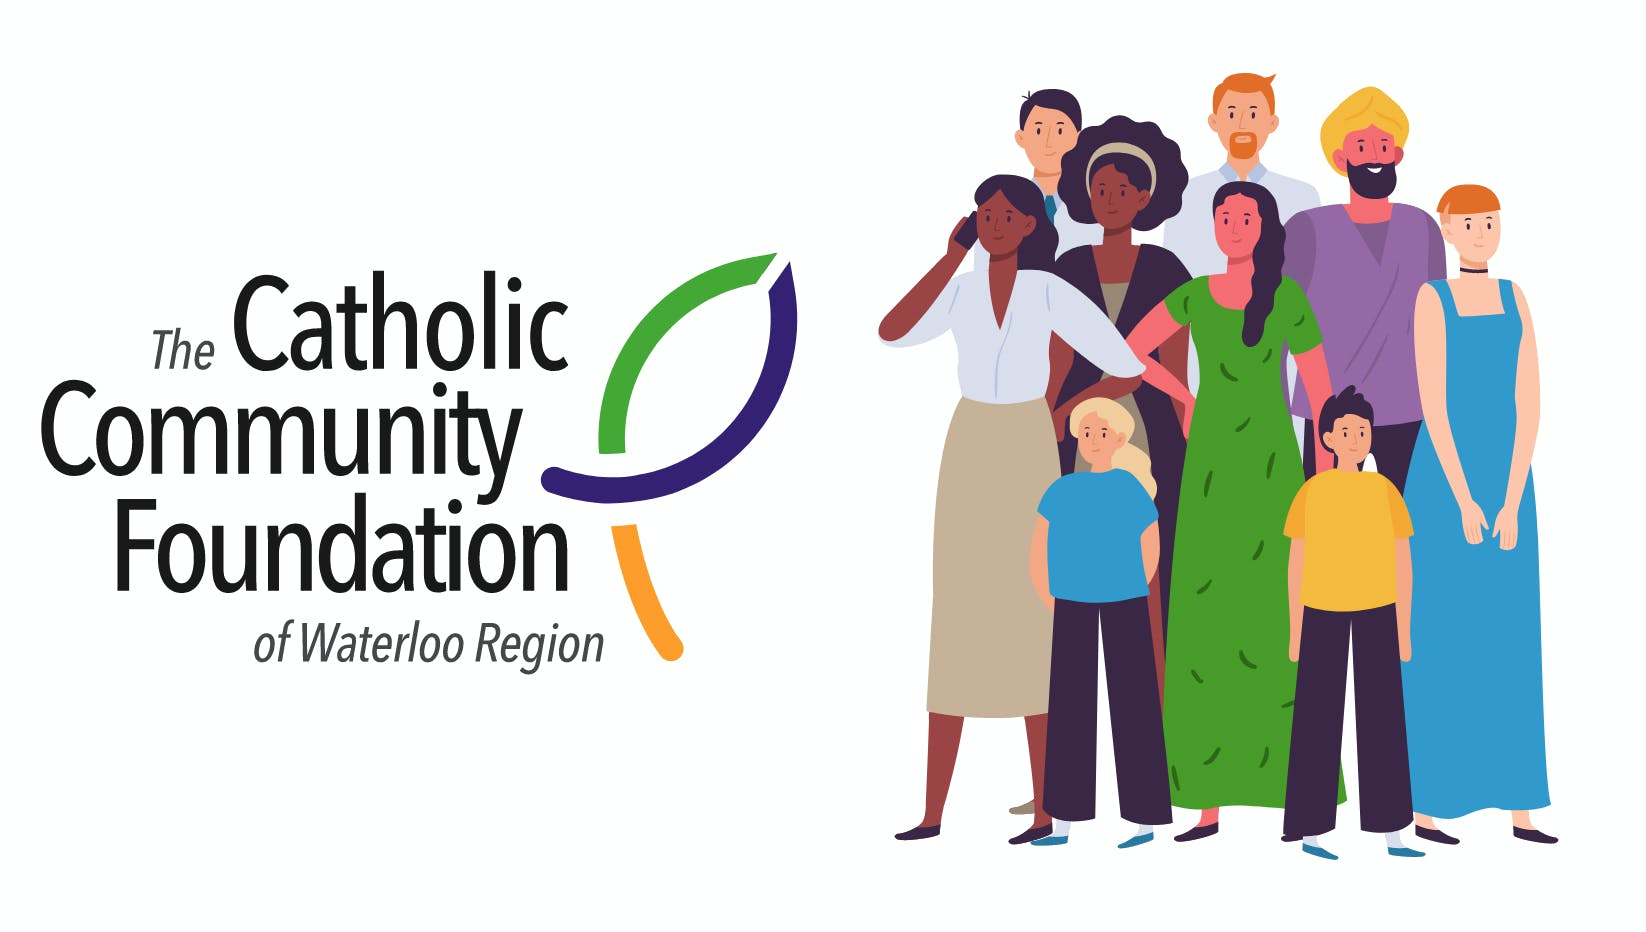 The Catholic Community Foundation of Waterloo Region Project Graphic